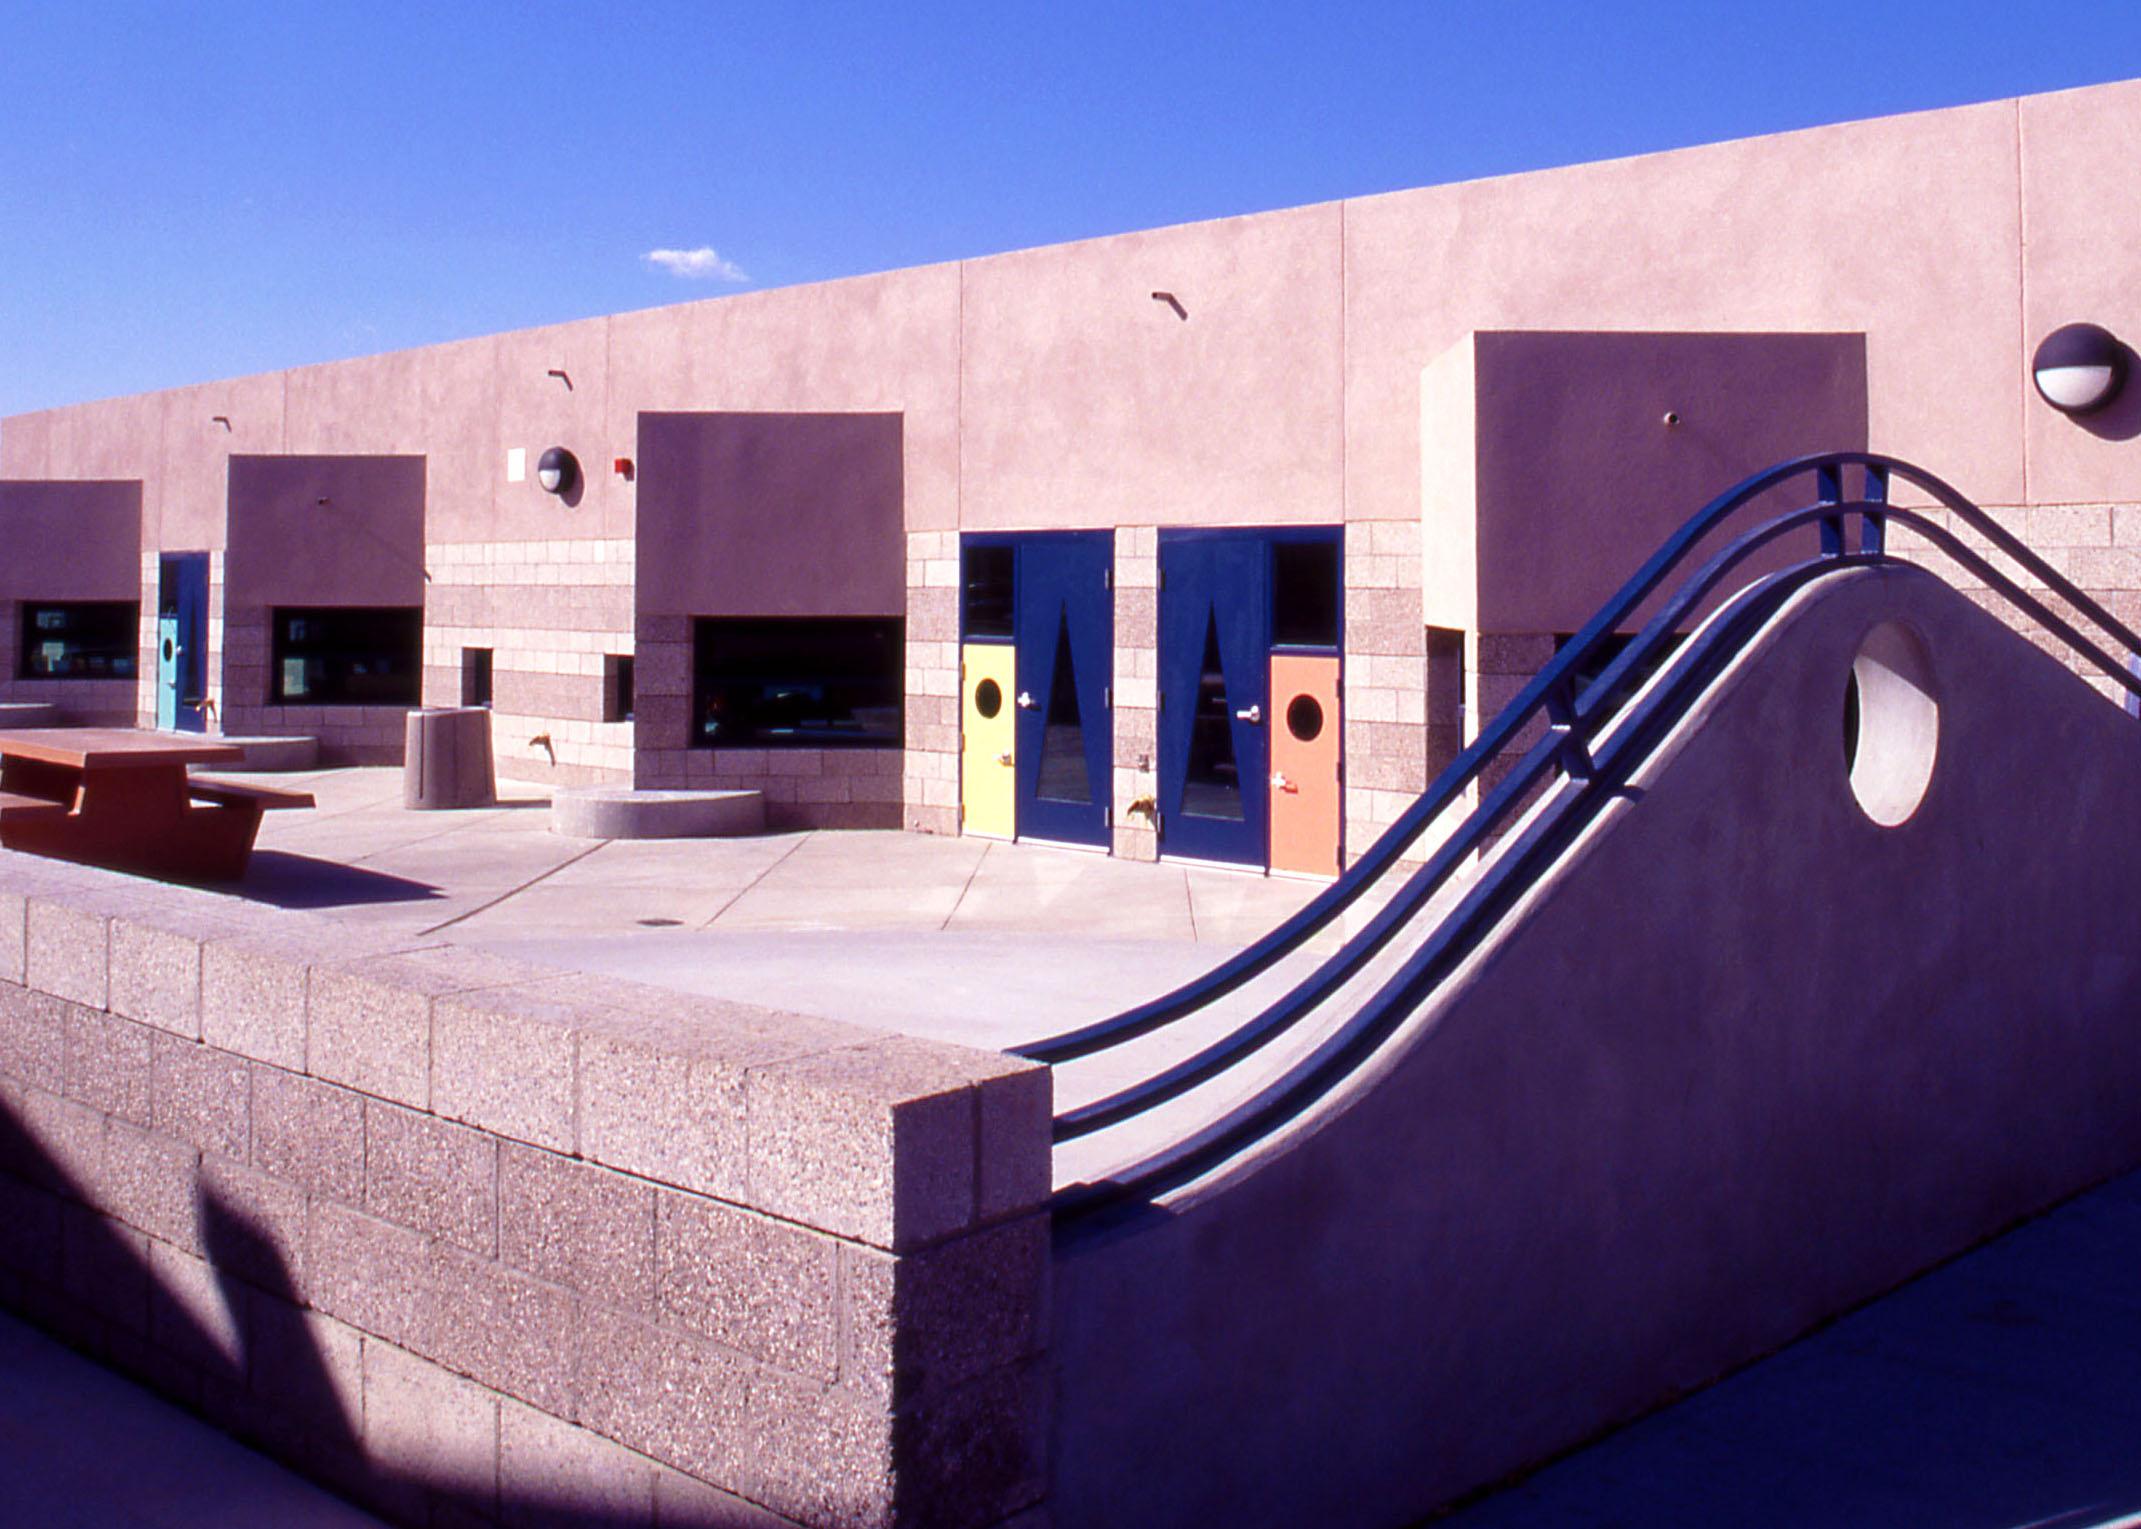 East_San_Jose_Elementary_School_02.jpg